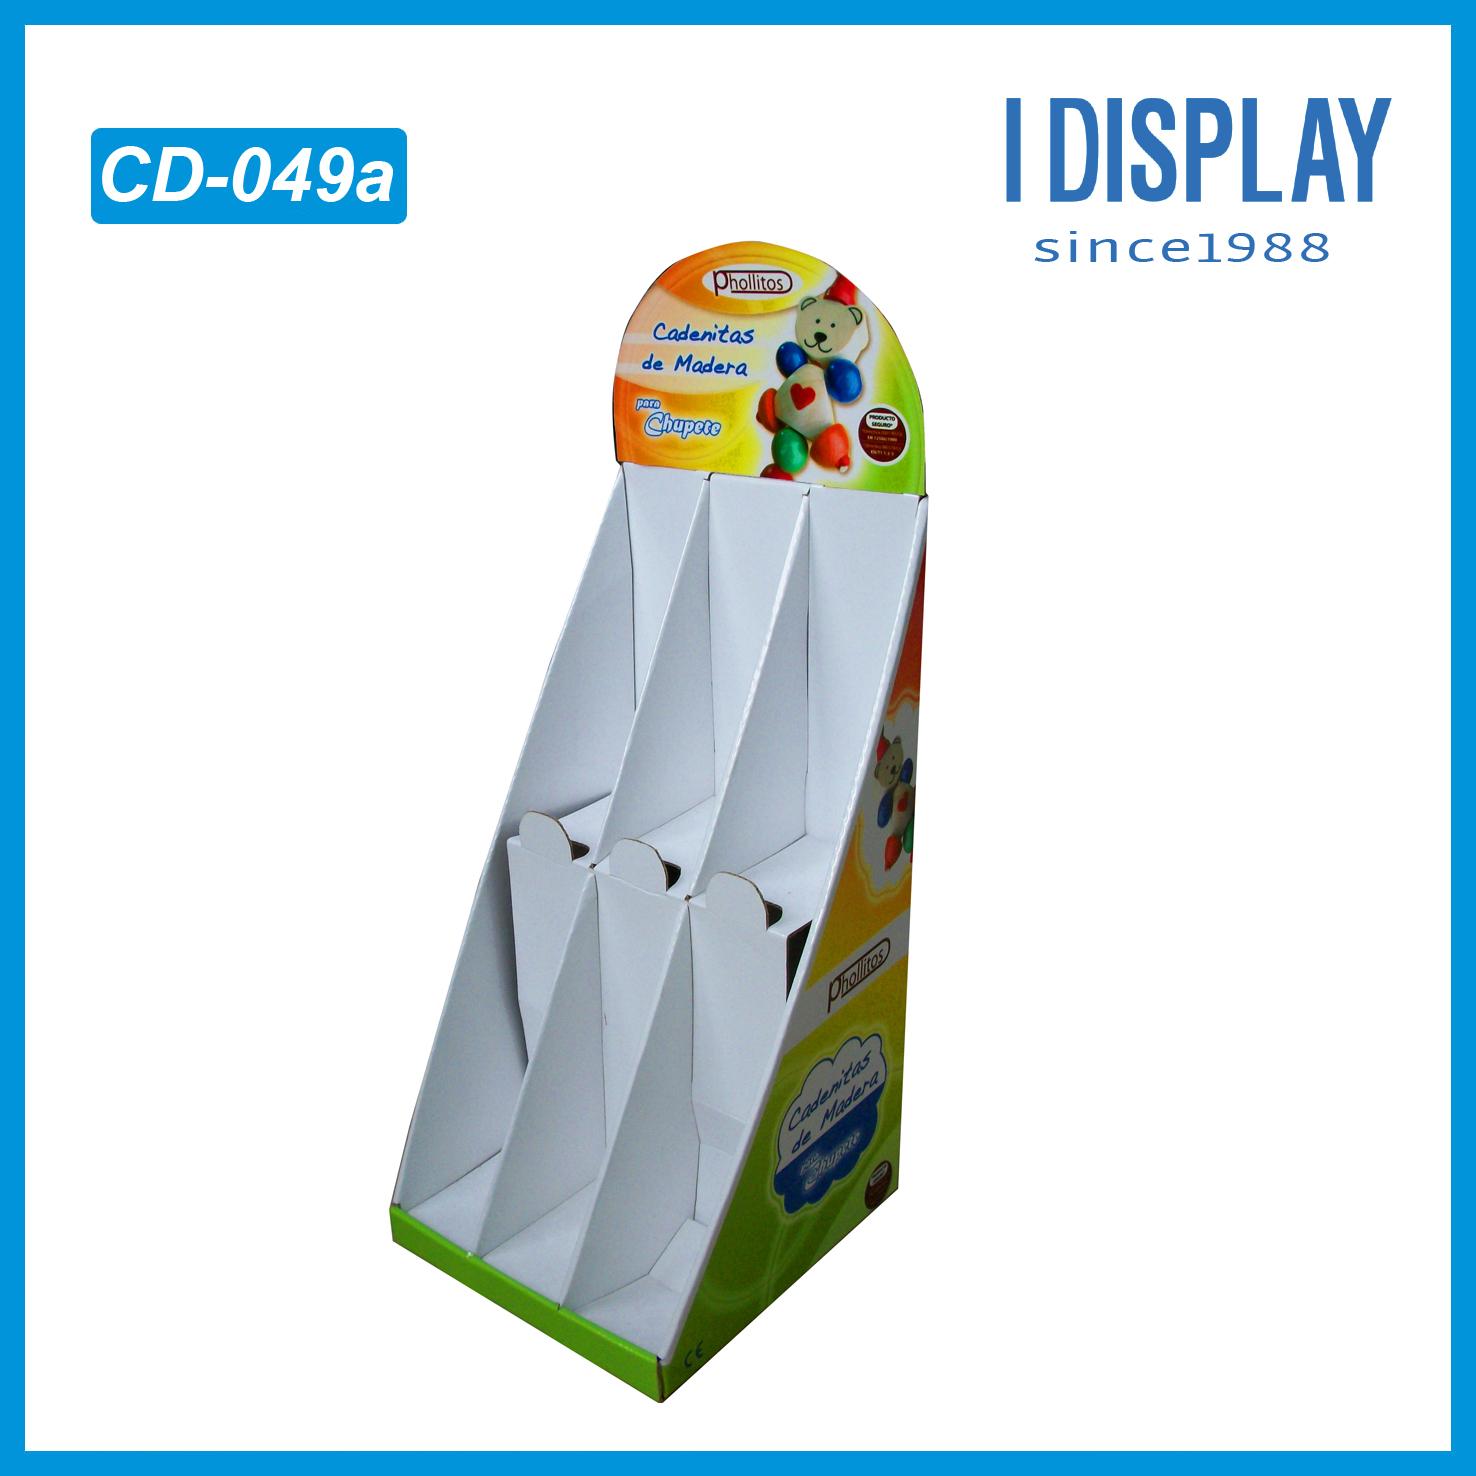 Pop Display Cardboard Greeting Card Display Stand Counter Display